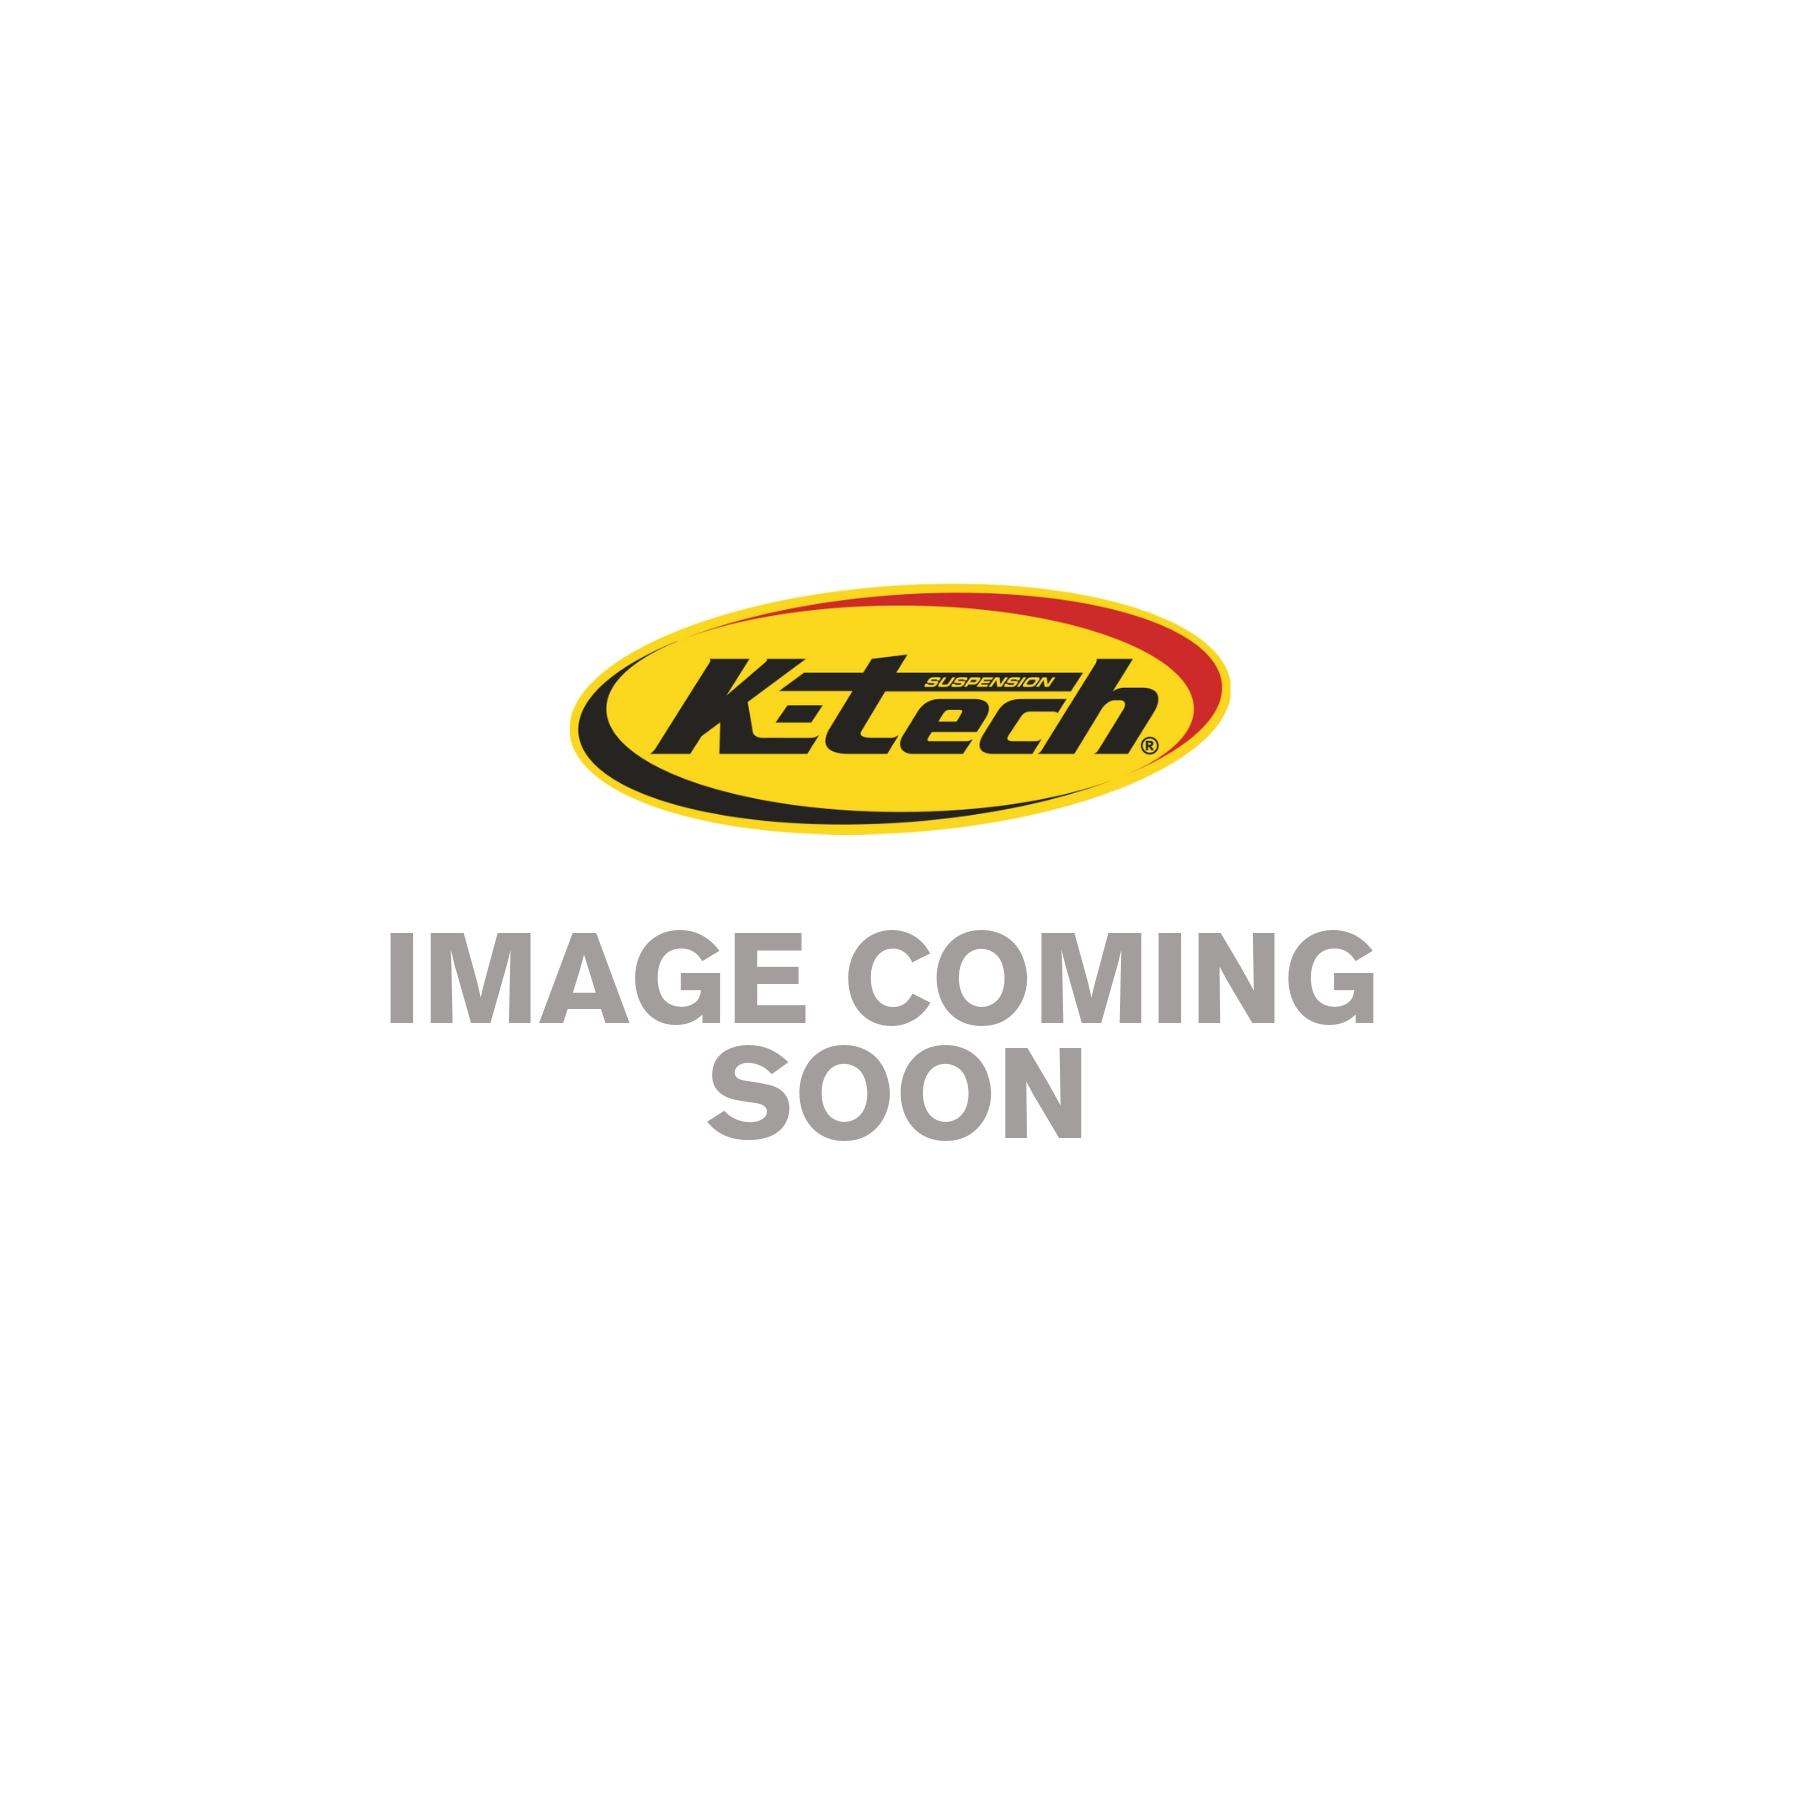 25IDS Front Fork Cartridges Yamaha YZF-R1M 2015> Ohlins